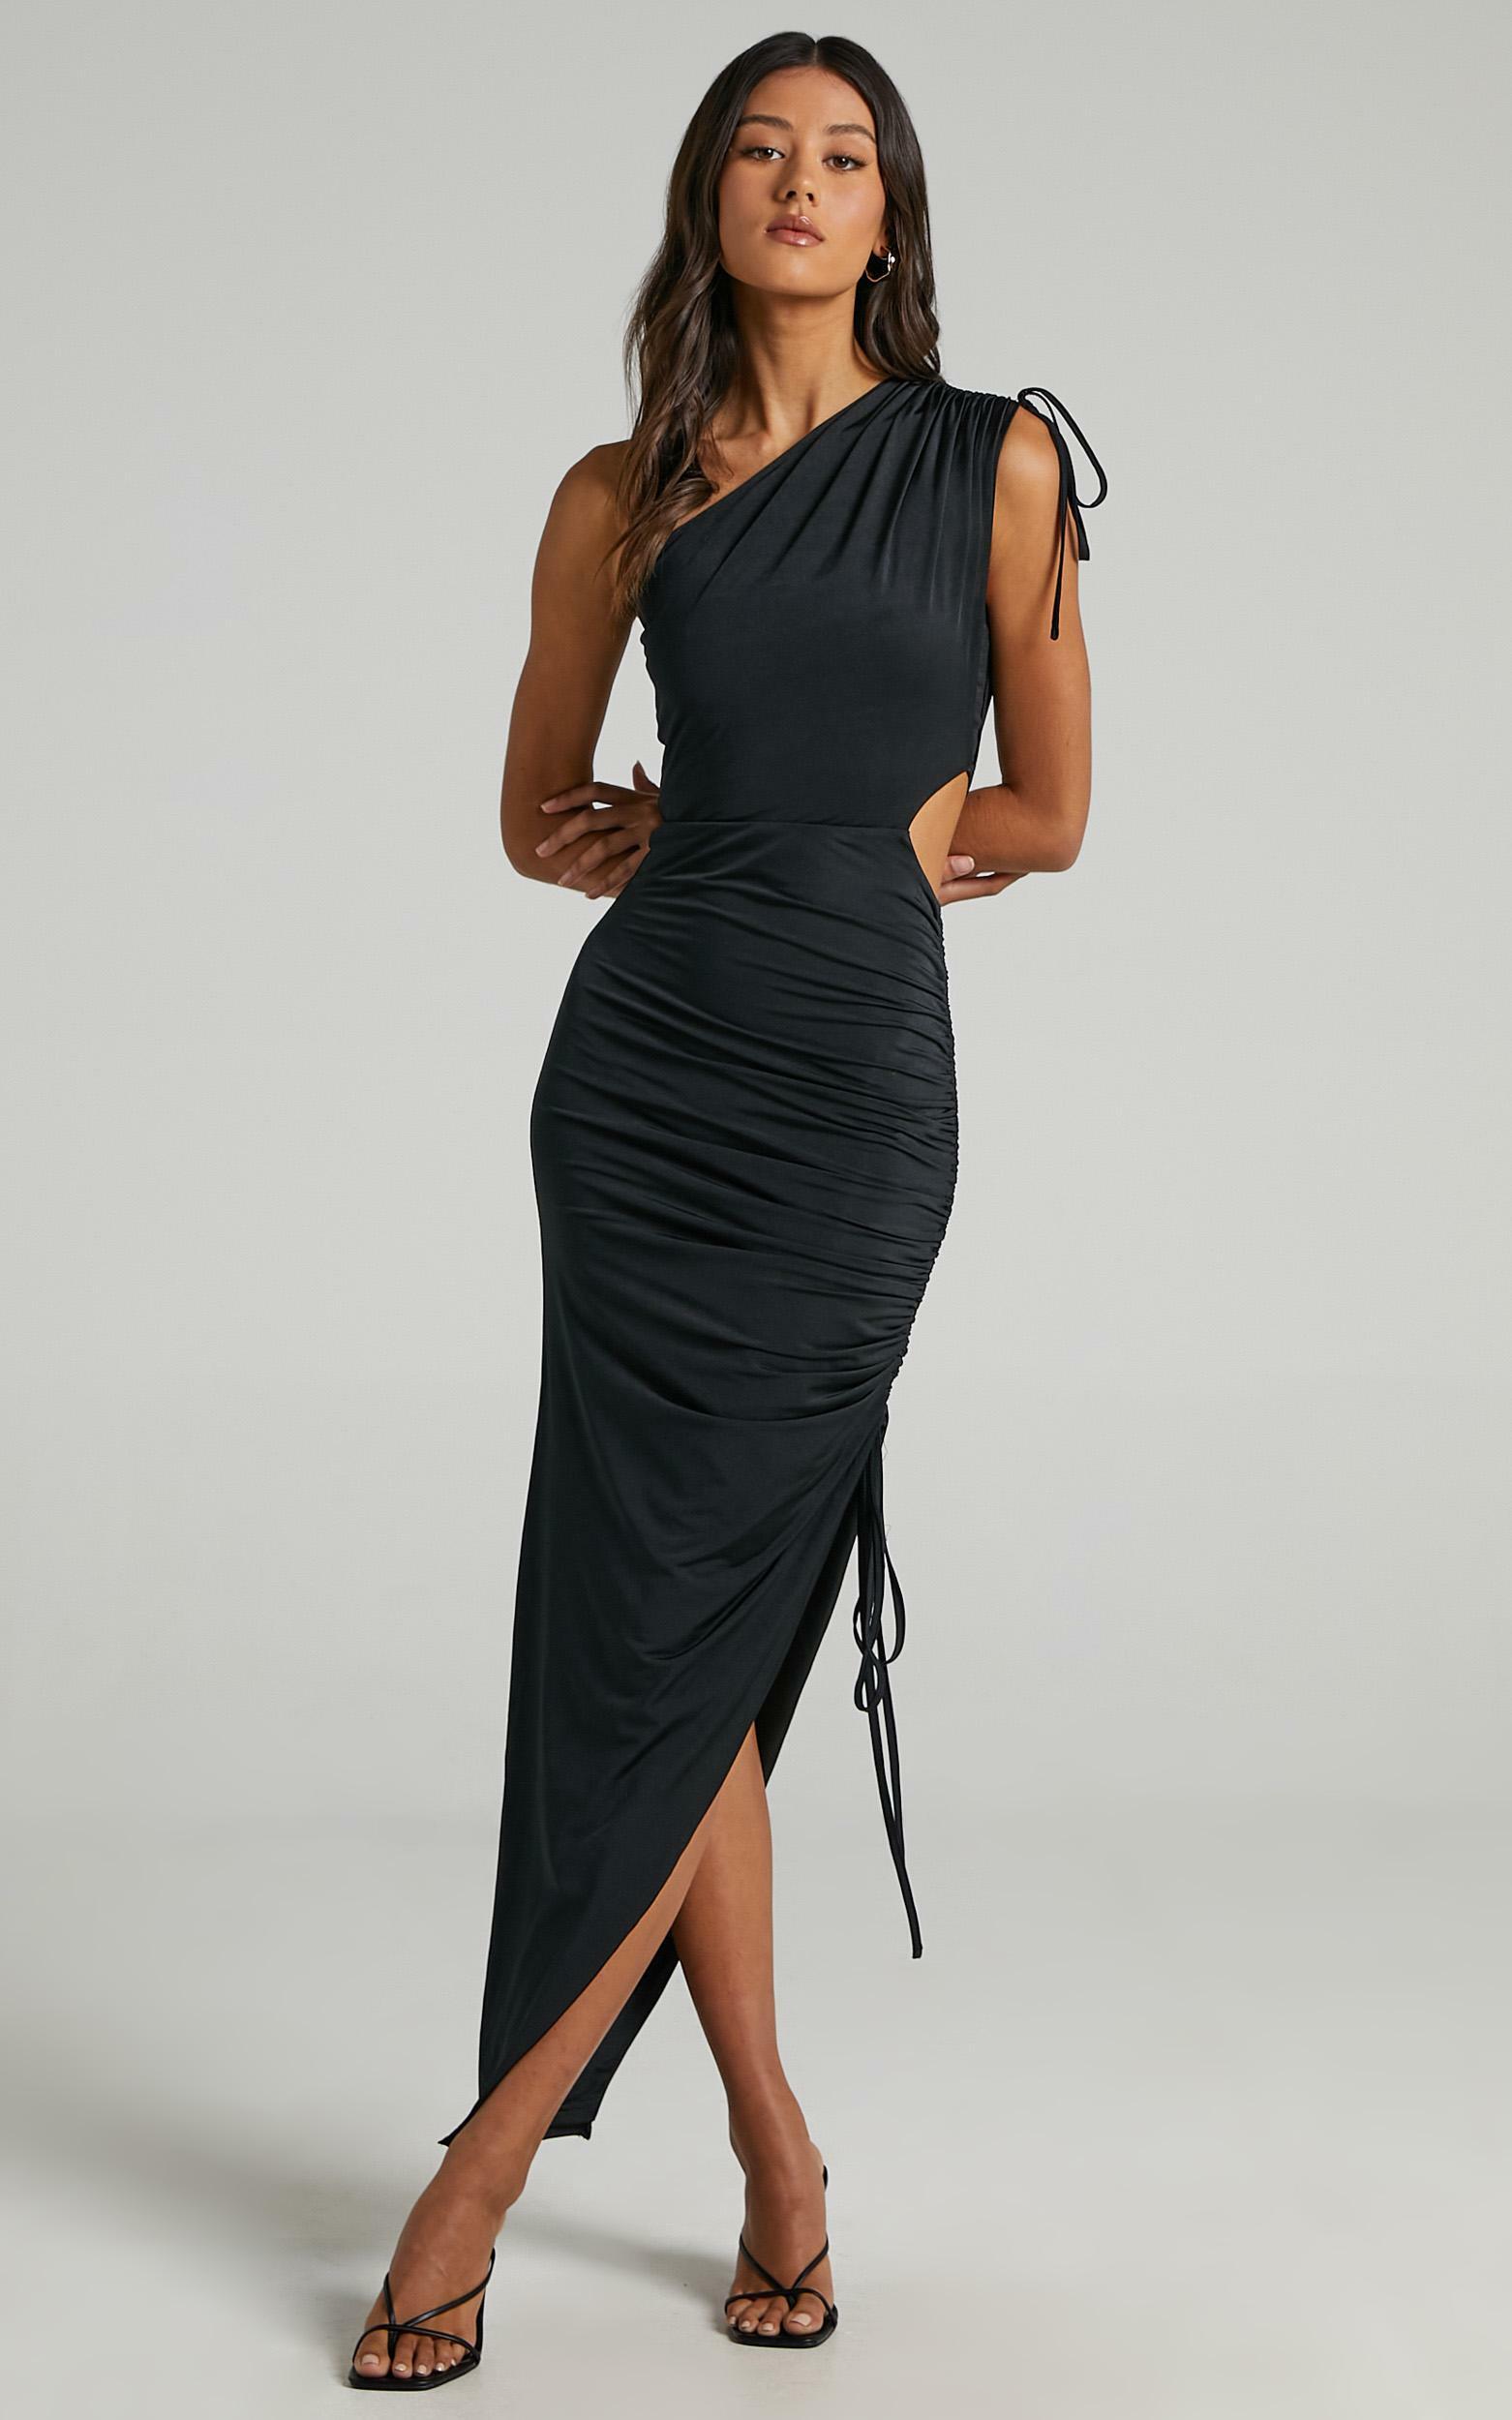 Dionyza Dress in Black - 6 (XS), Black, hi-res image number null